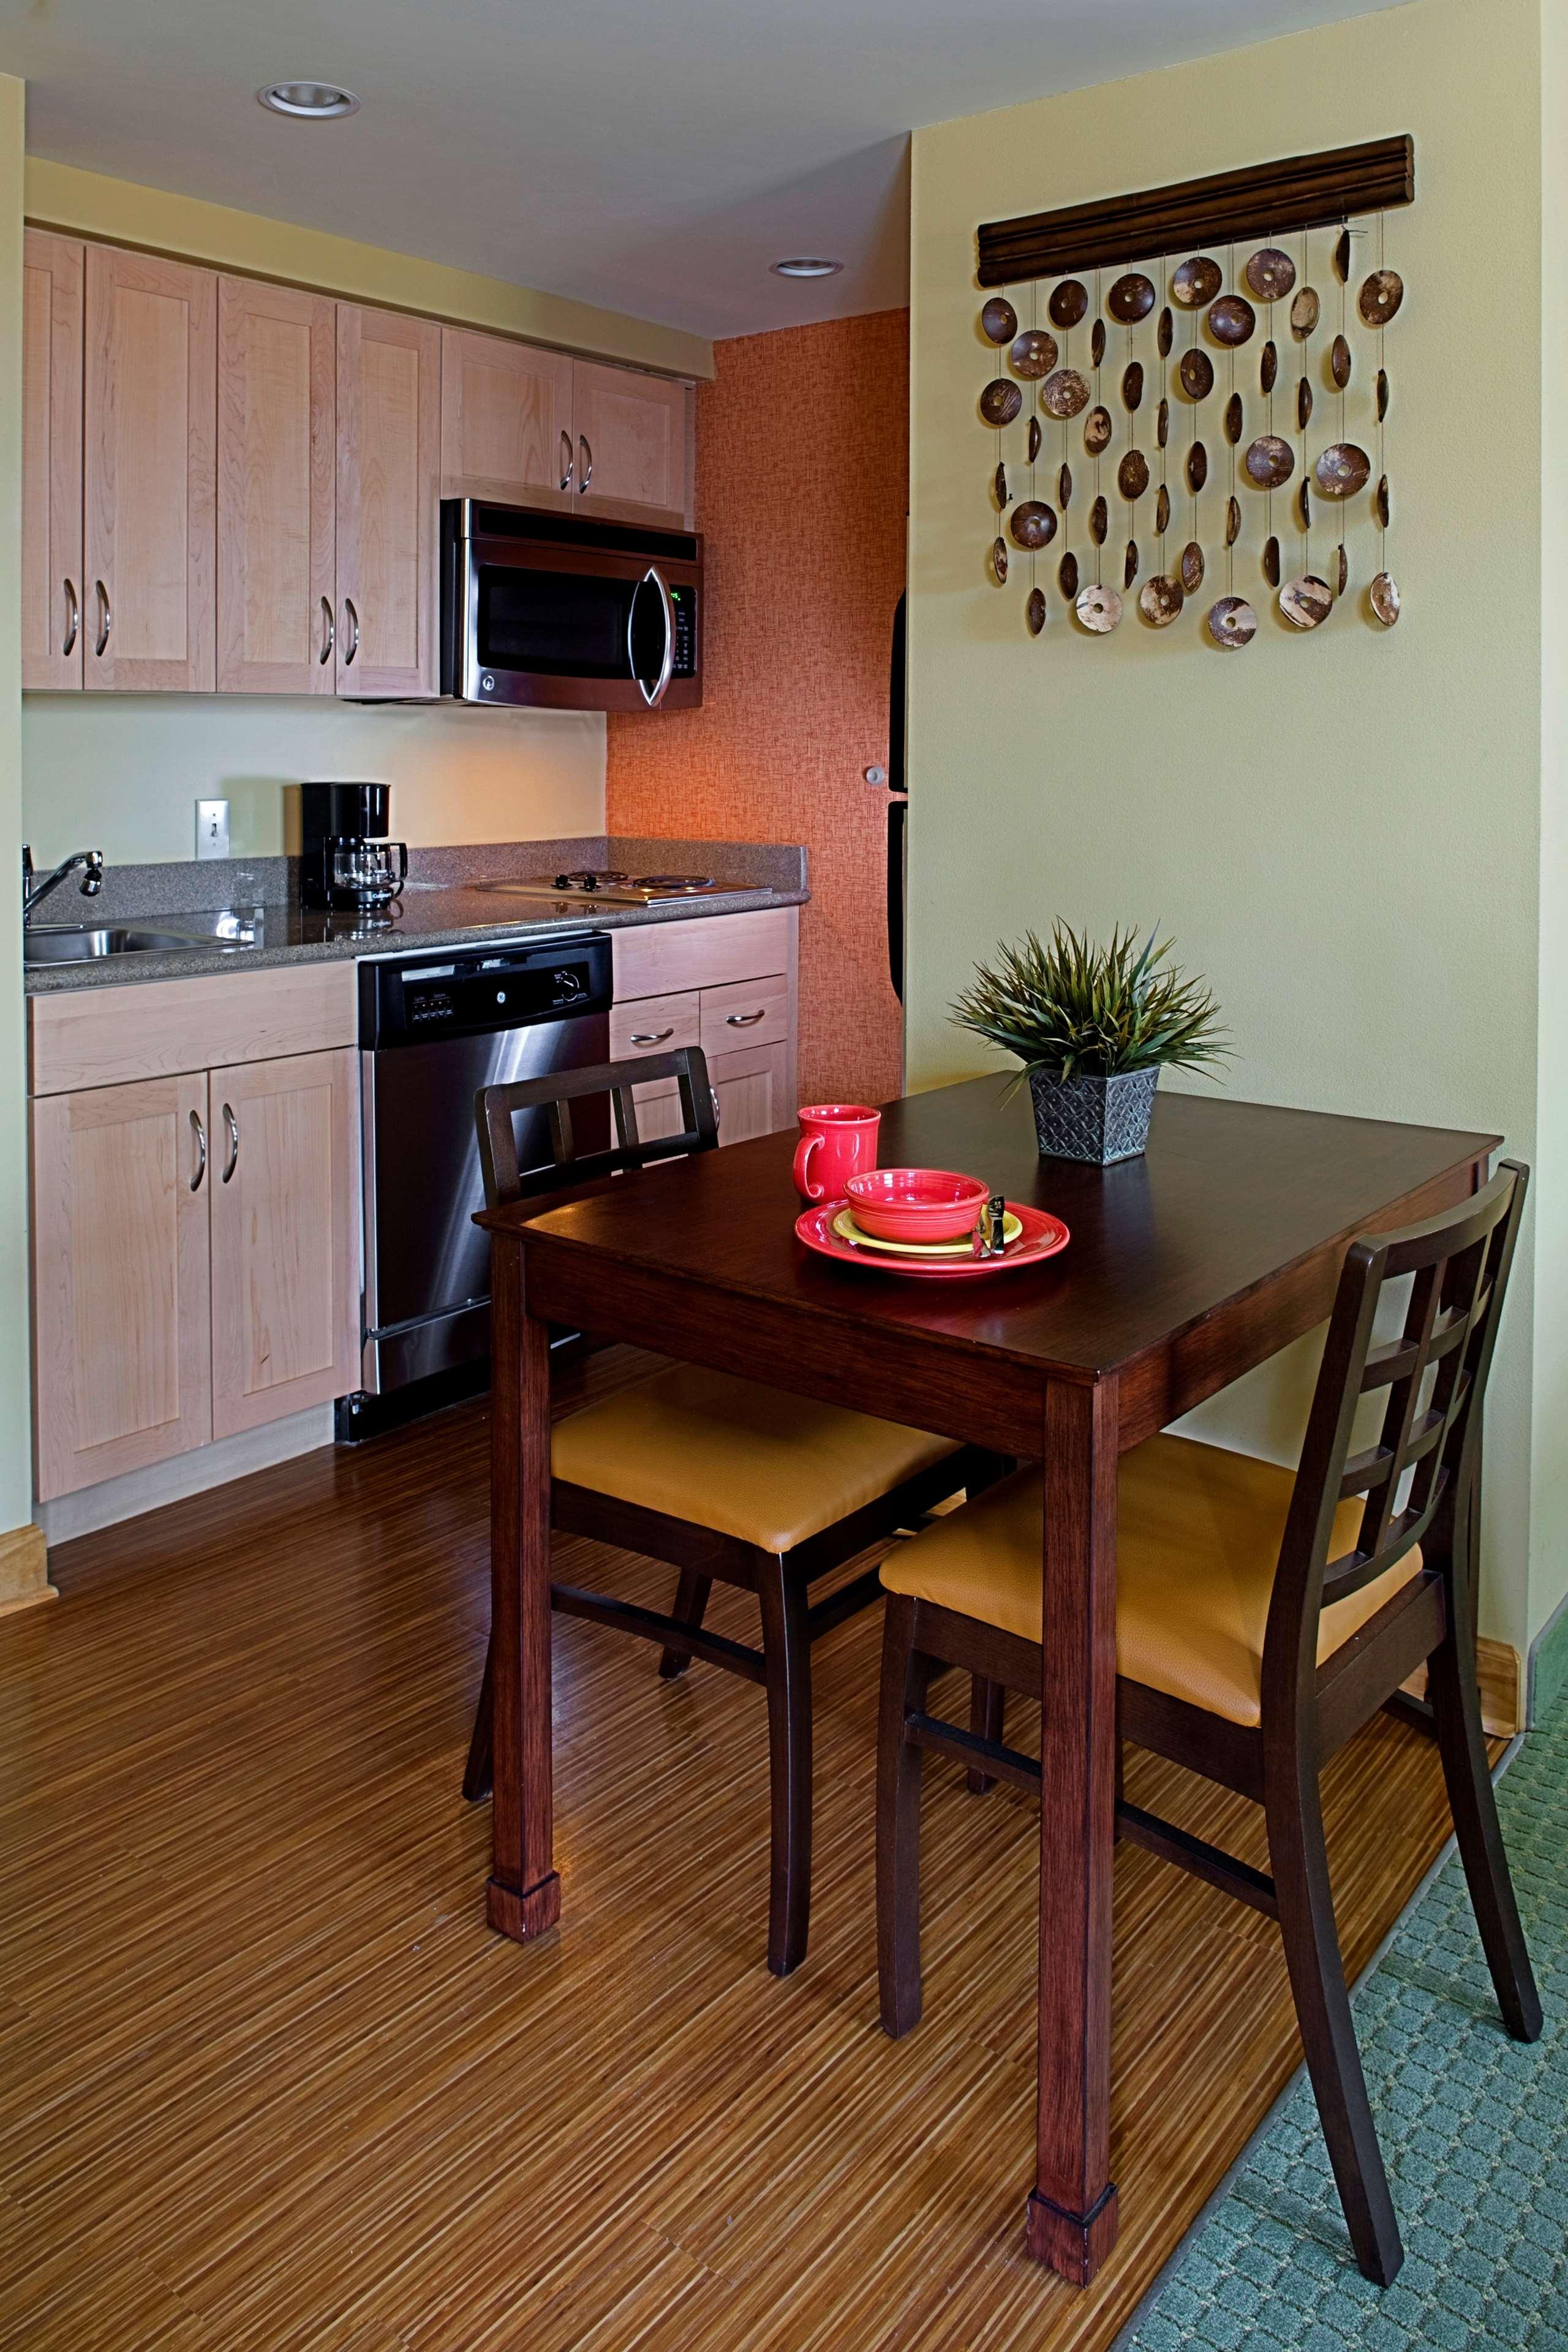 Homewood Suites by Hilton Columbus image 14